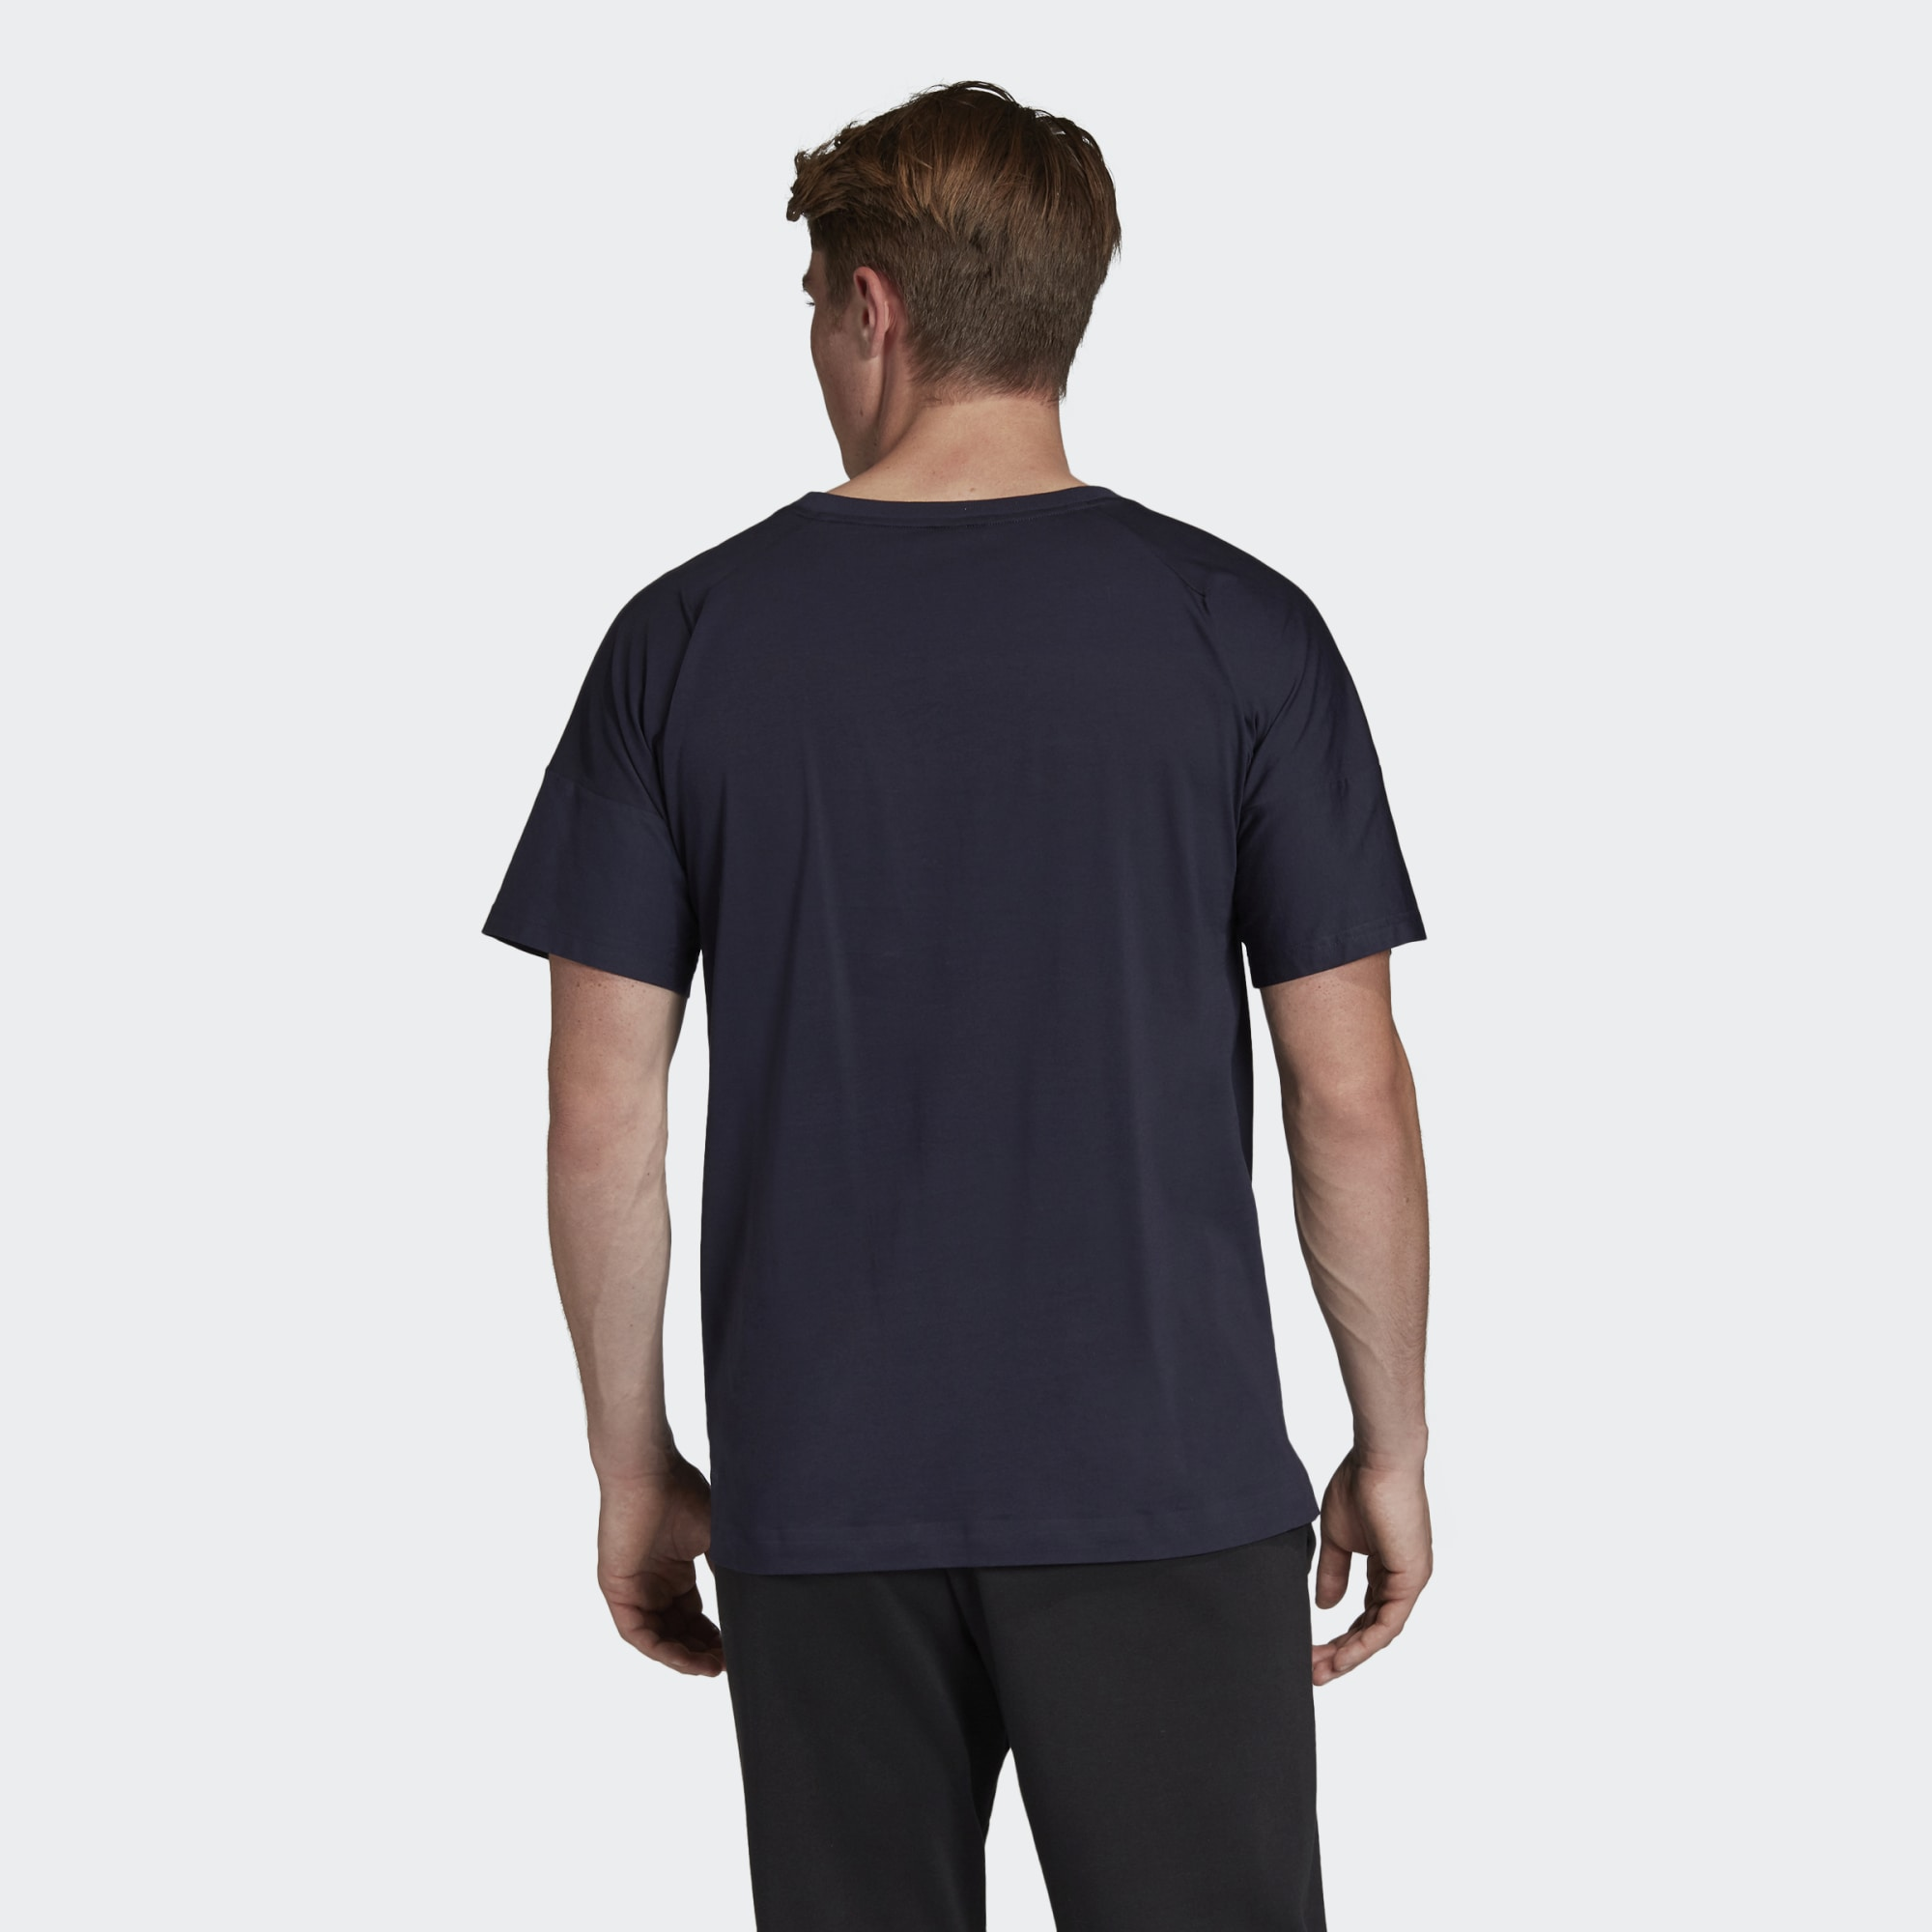 Adidas Z.n.e. 3 stripes T shirt bis zu 70 %   AFOUND